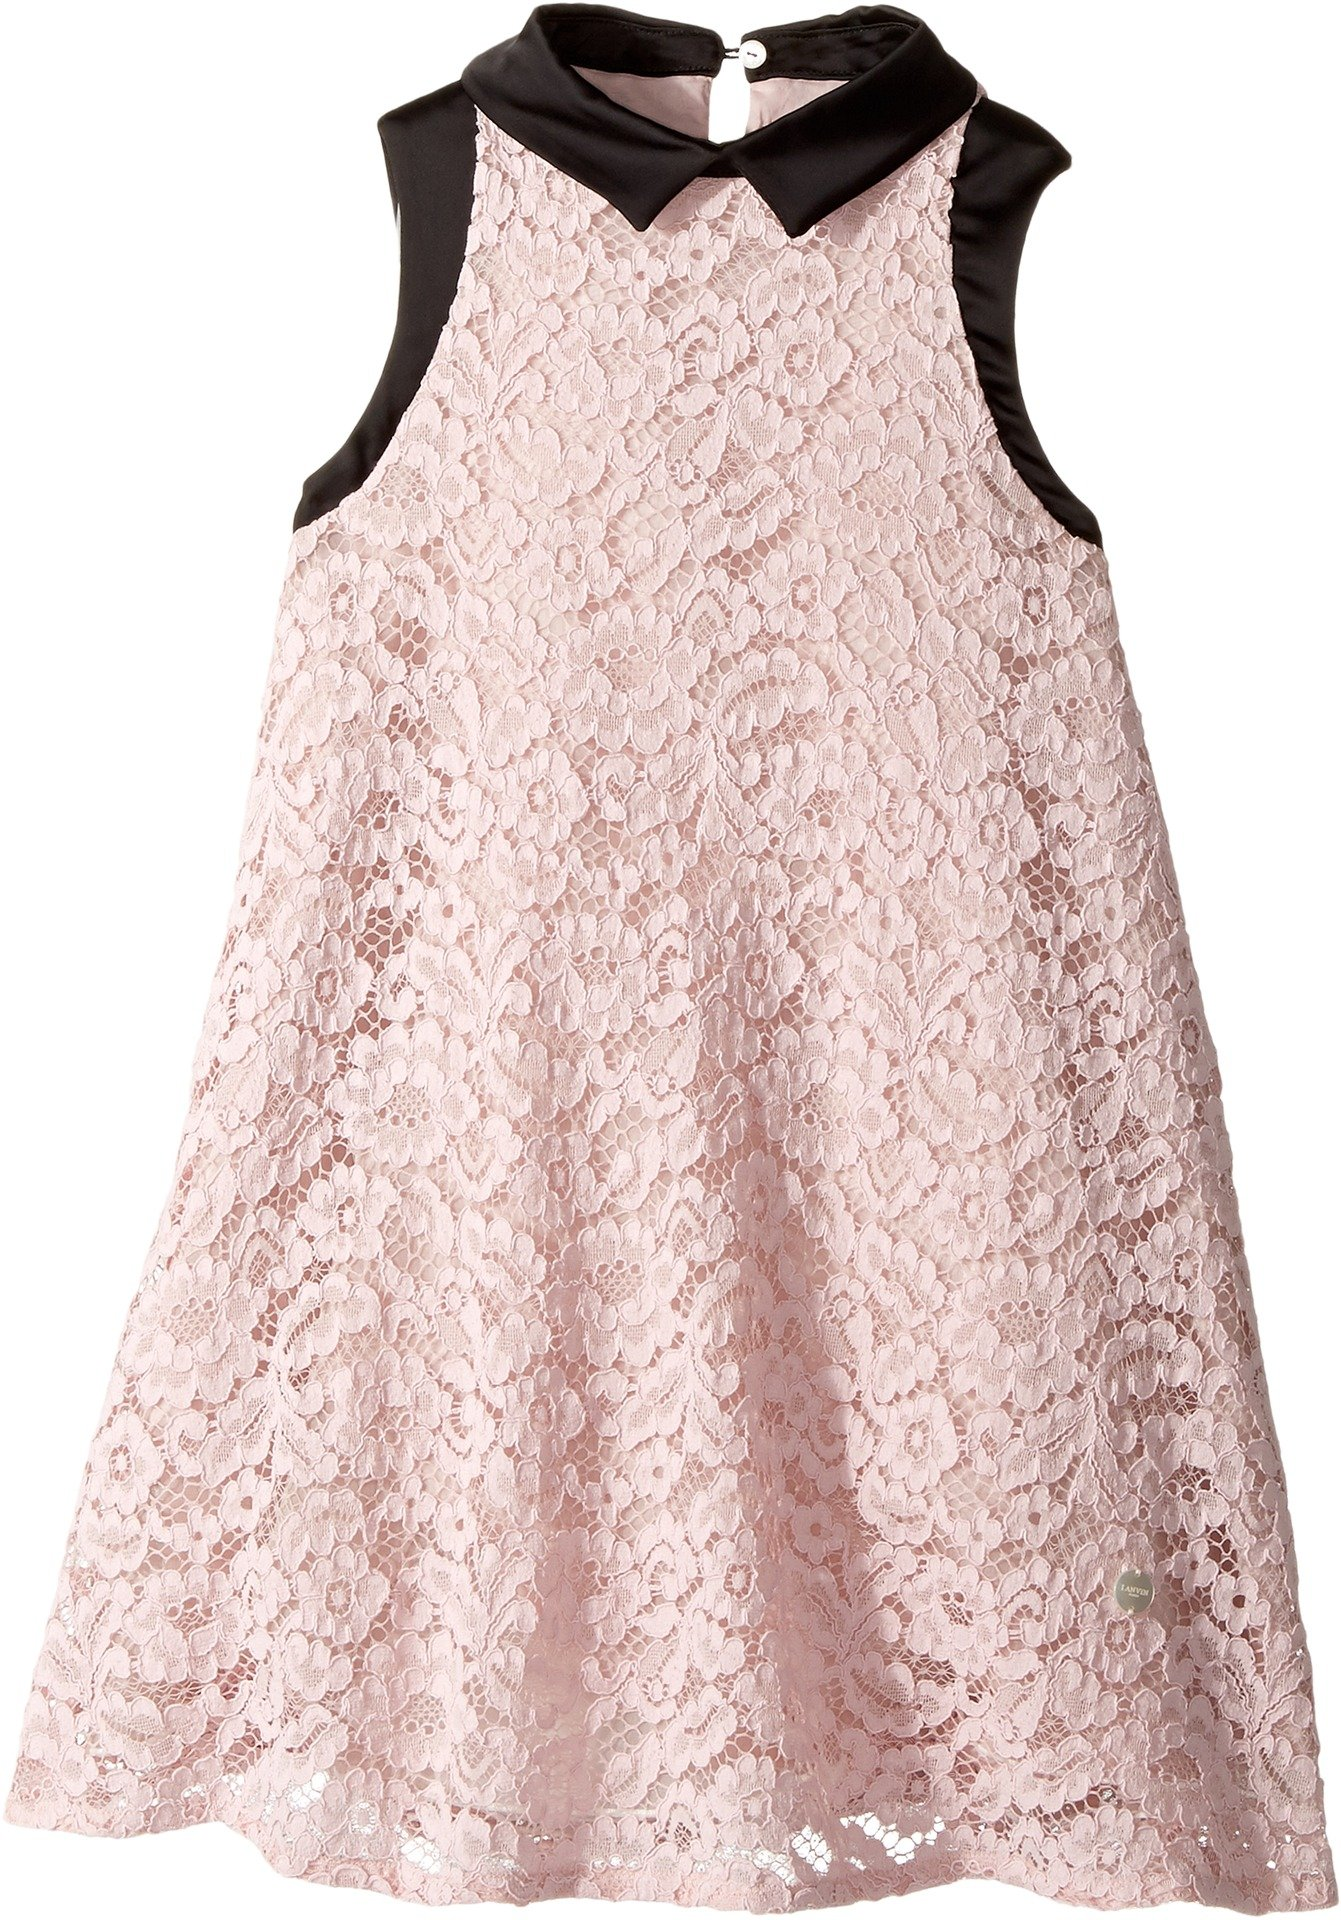 Lanvin Kids Girl's Sleeveless Lace Dress with Contrast Trim (Little Kids/Big Kids) Pink 8